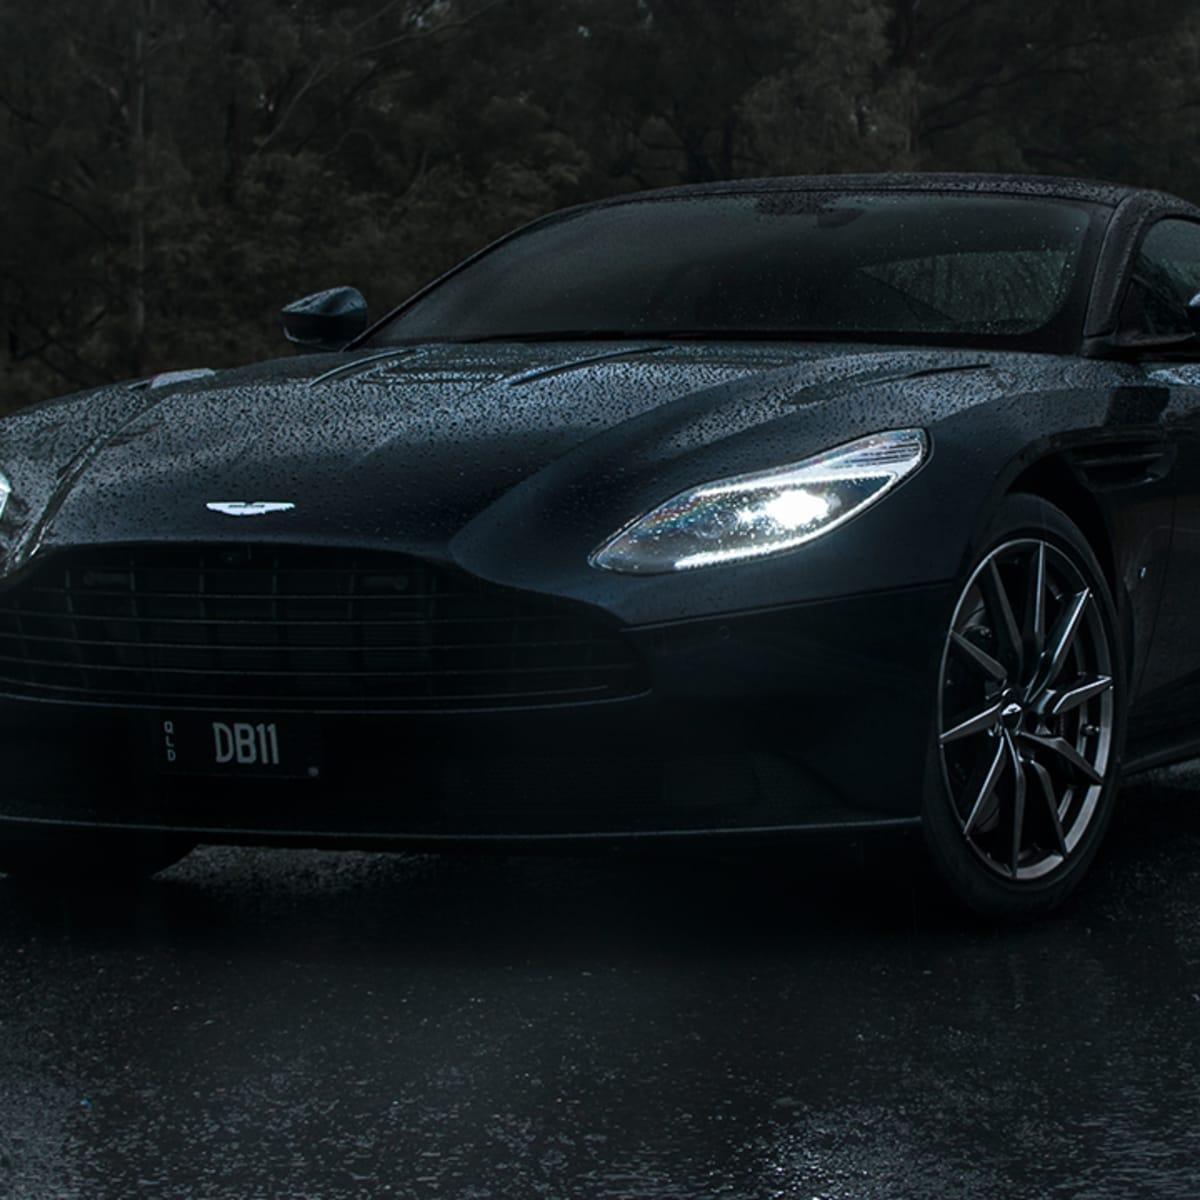 2017 Aston Martin Db11 Review Caradvice